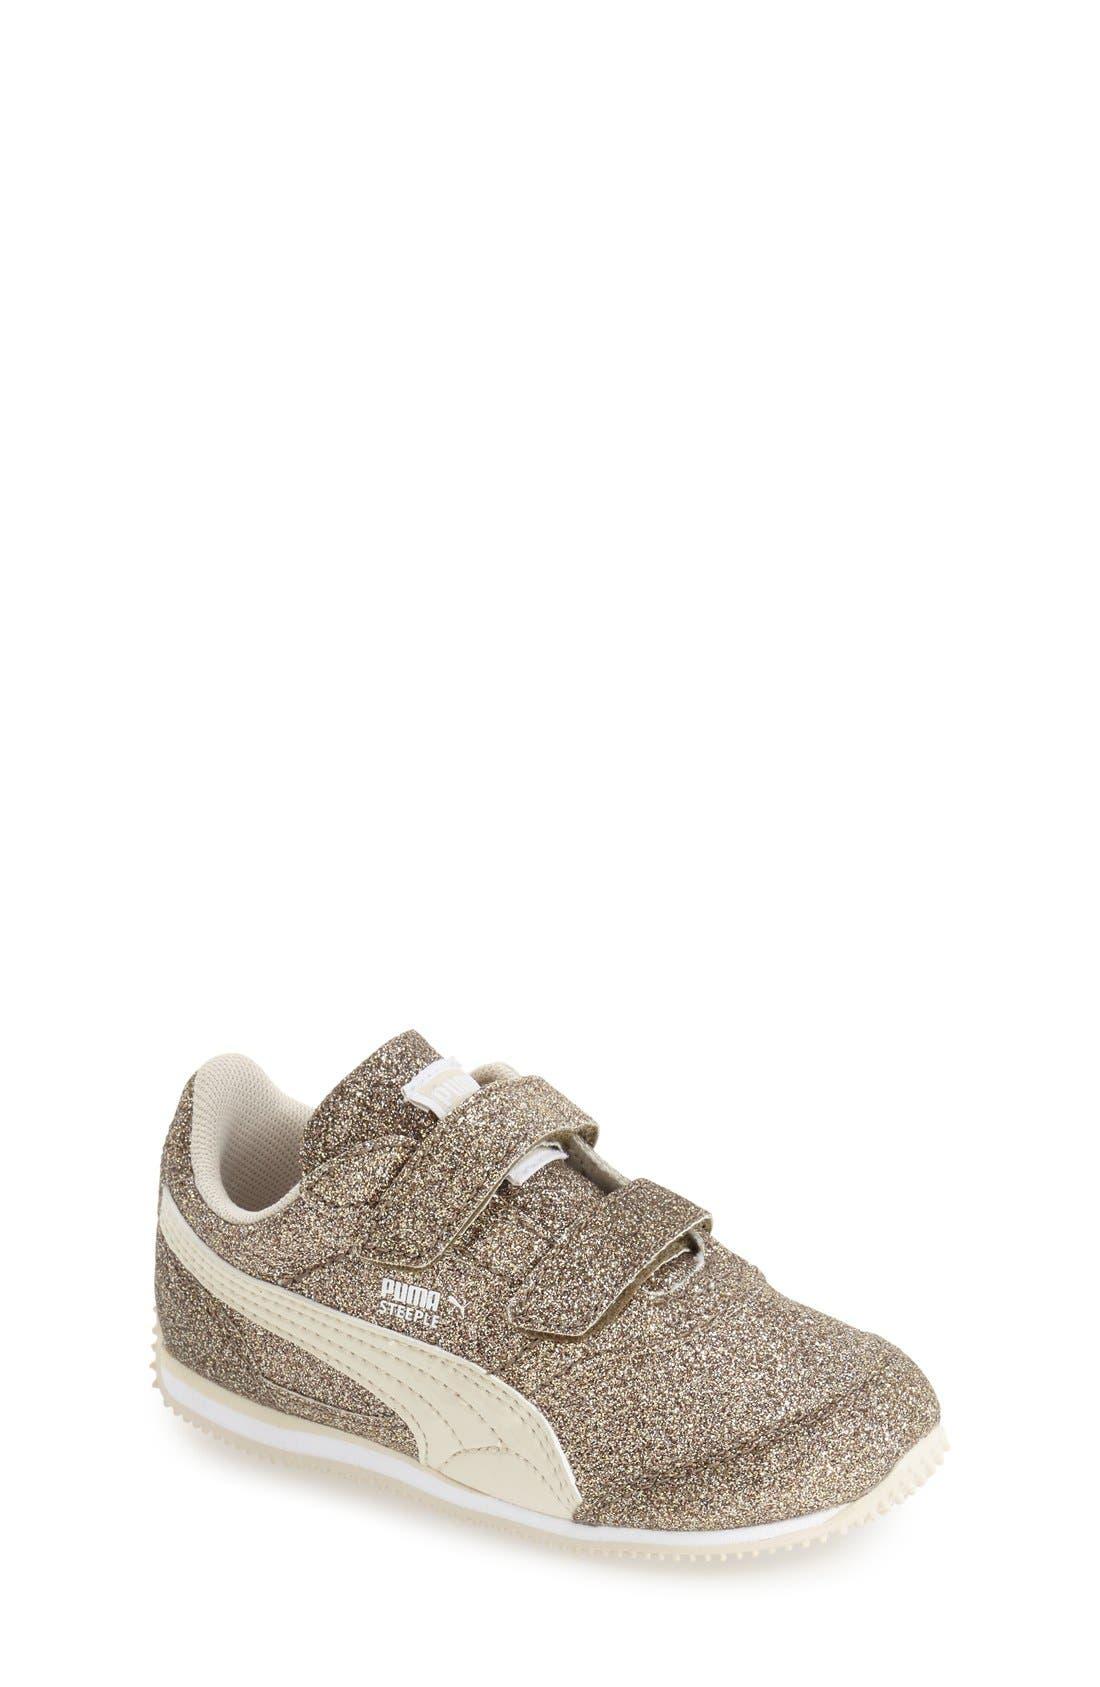 PUMA Steeple Glitz Sneaker (Baby, Walker & Toddler)